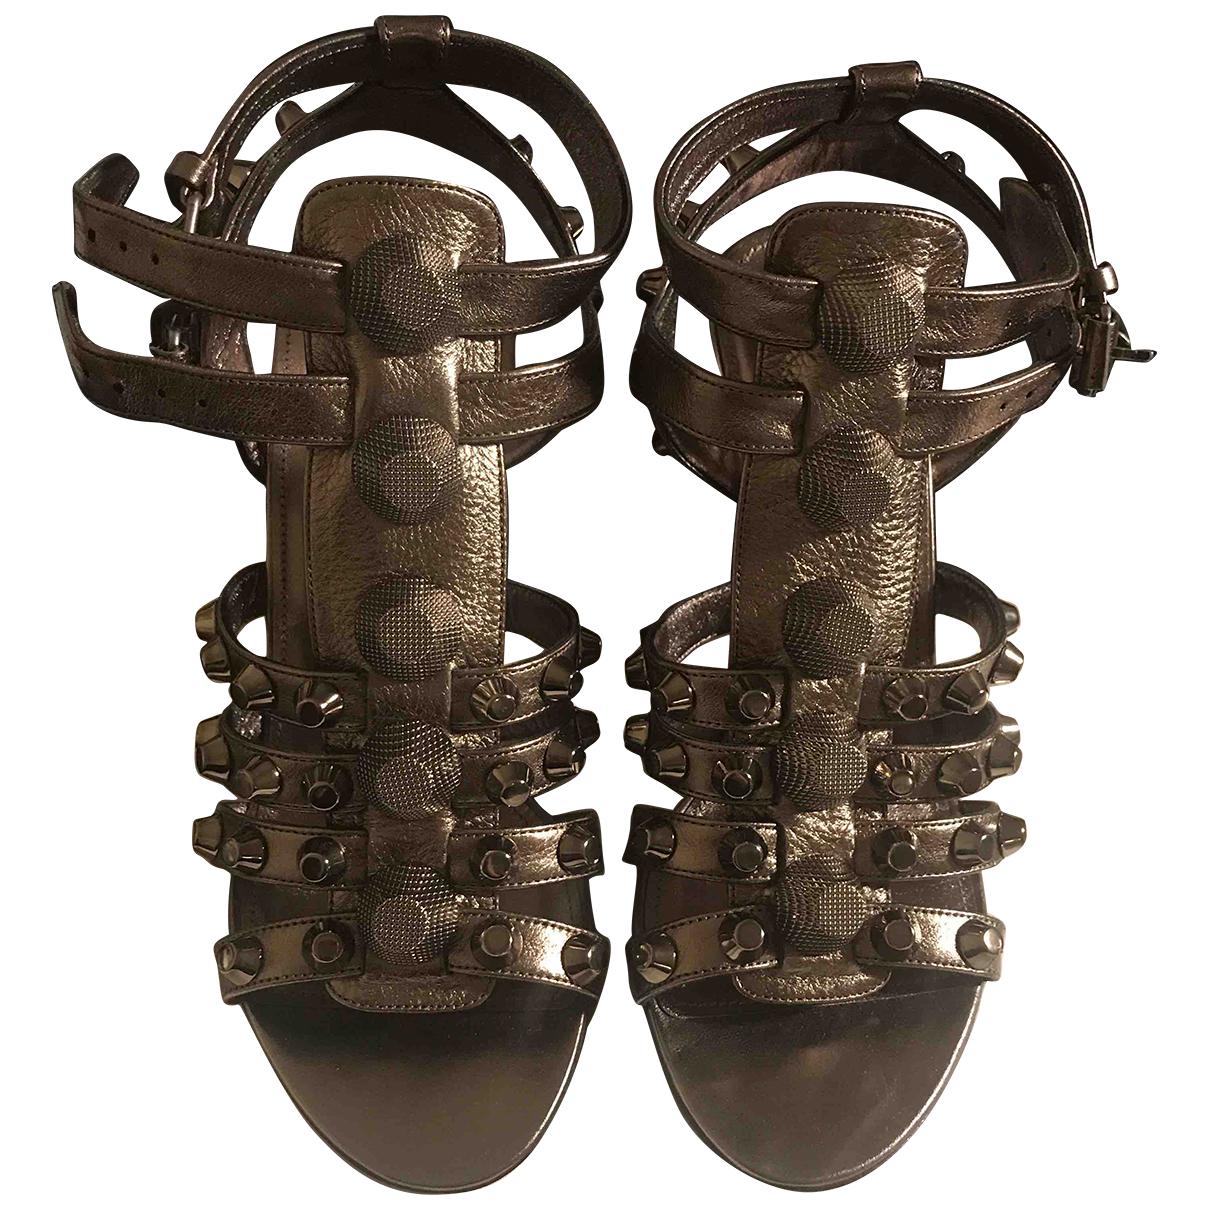 Balenciaga N Silver Leather Sandals for Women 36.5 EU